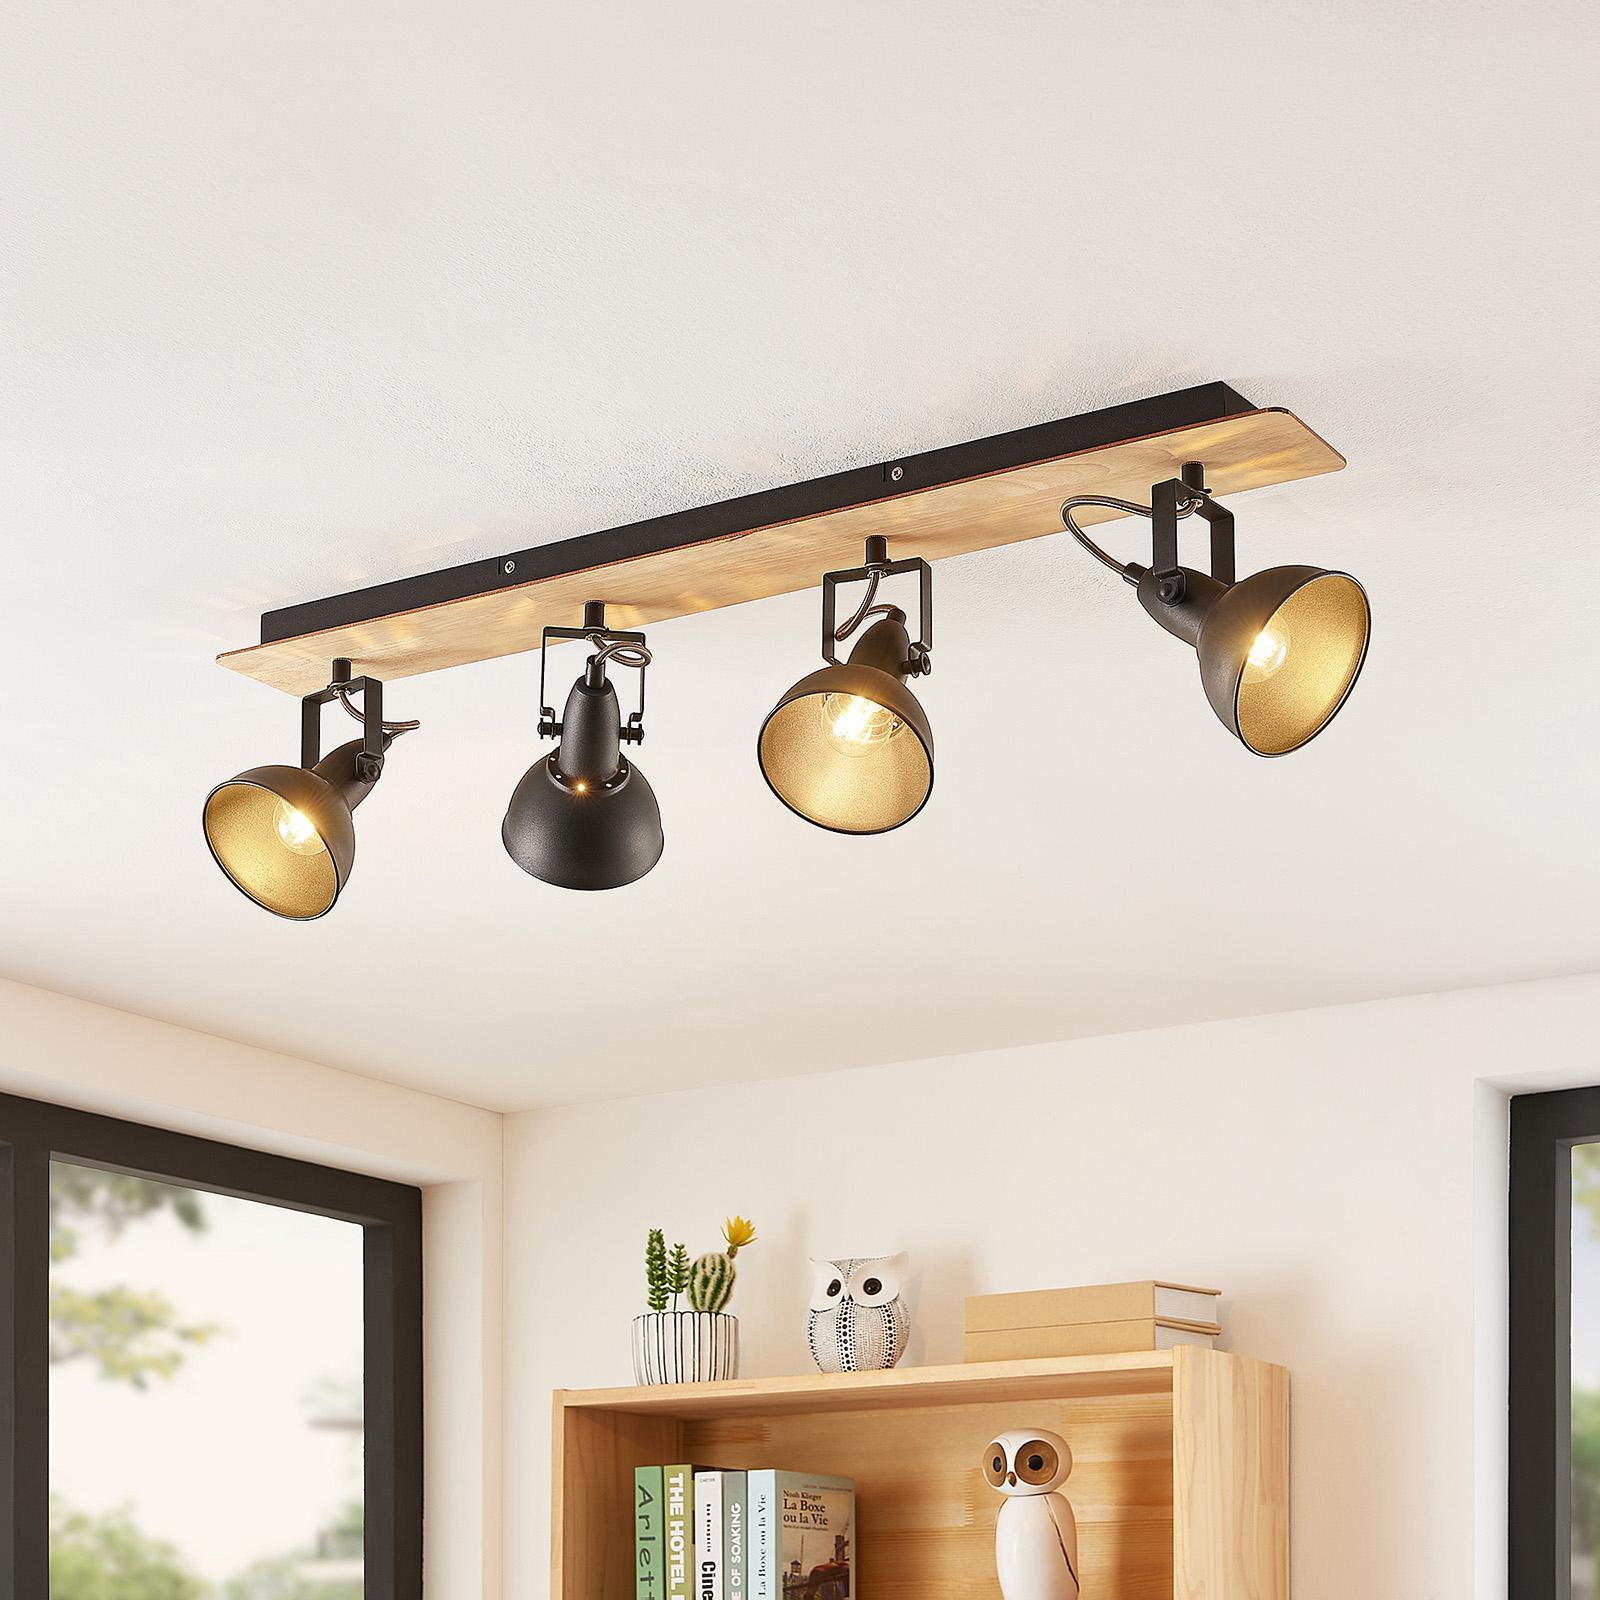 Lindby Aylis taklampe, svart, tre, 4 lyskilder